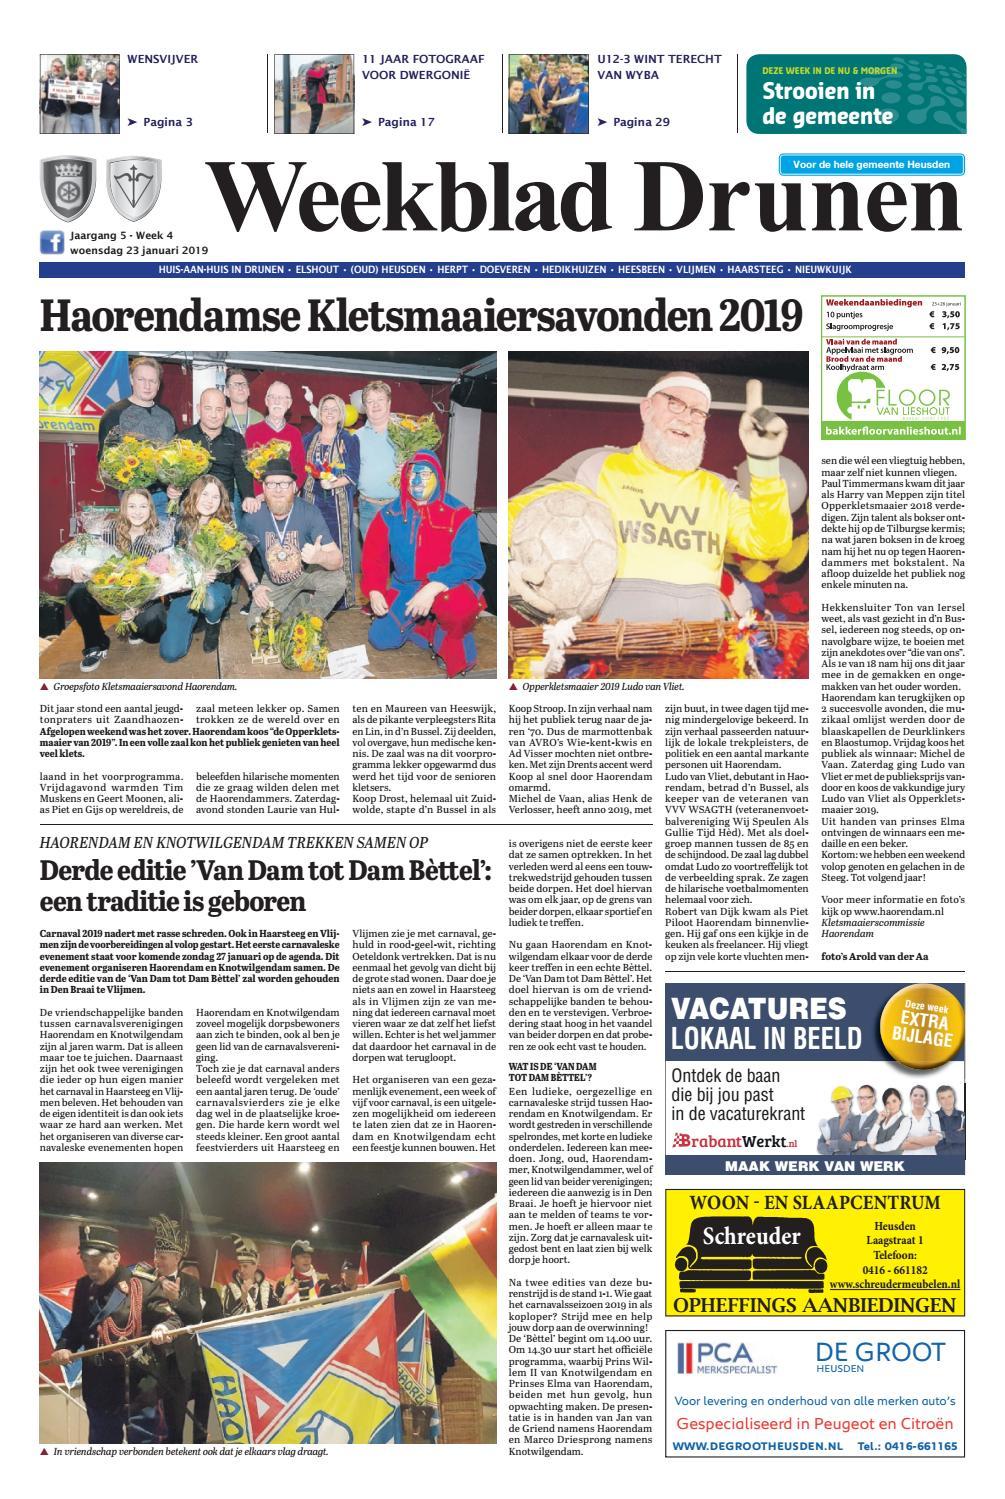 4c65f5bdaf5 Weekblad Drunen 23-01-2019 by Uitgeverij Em de Jong - issuu